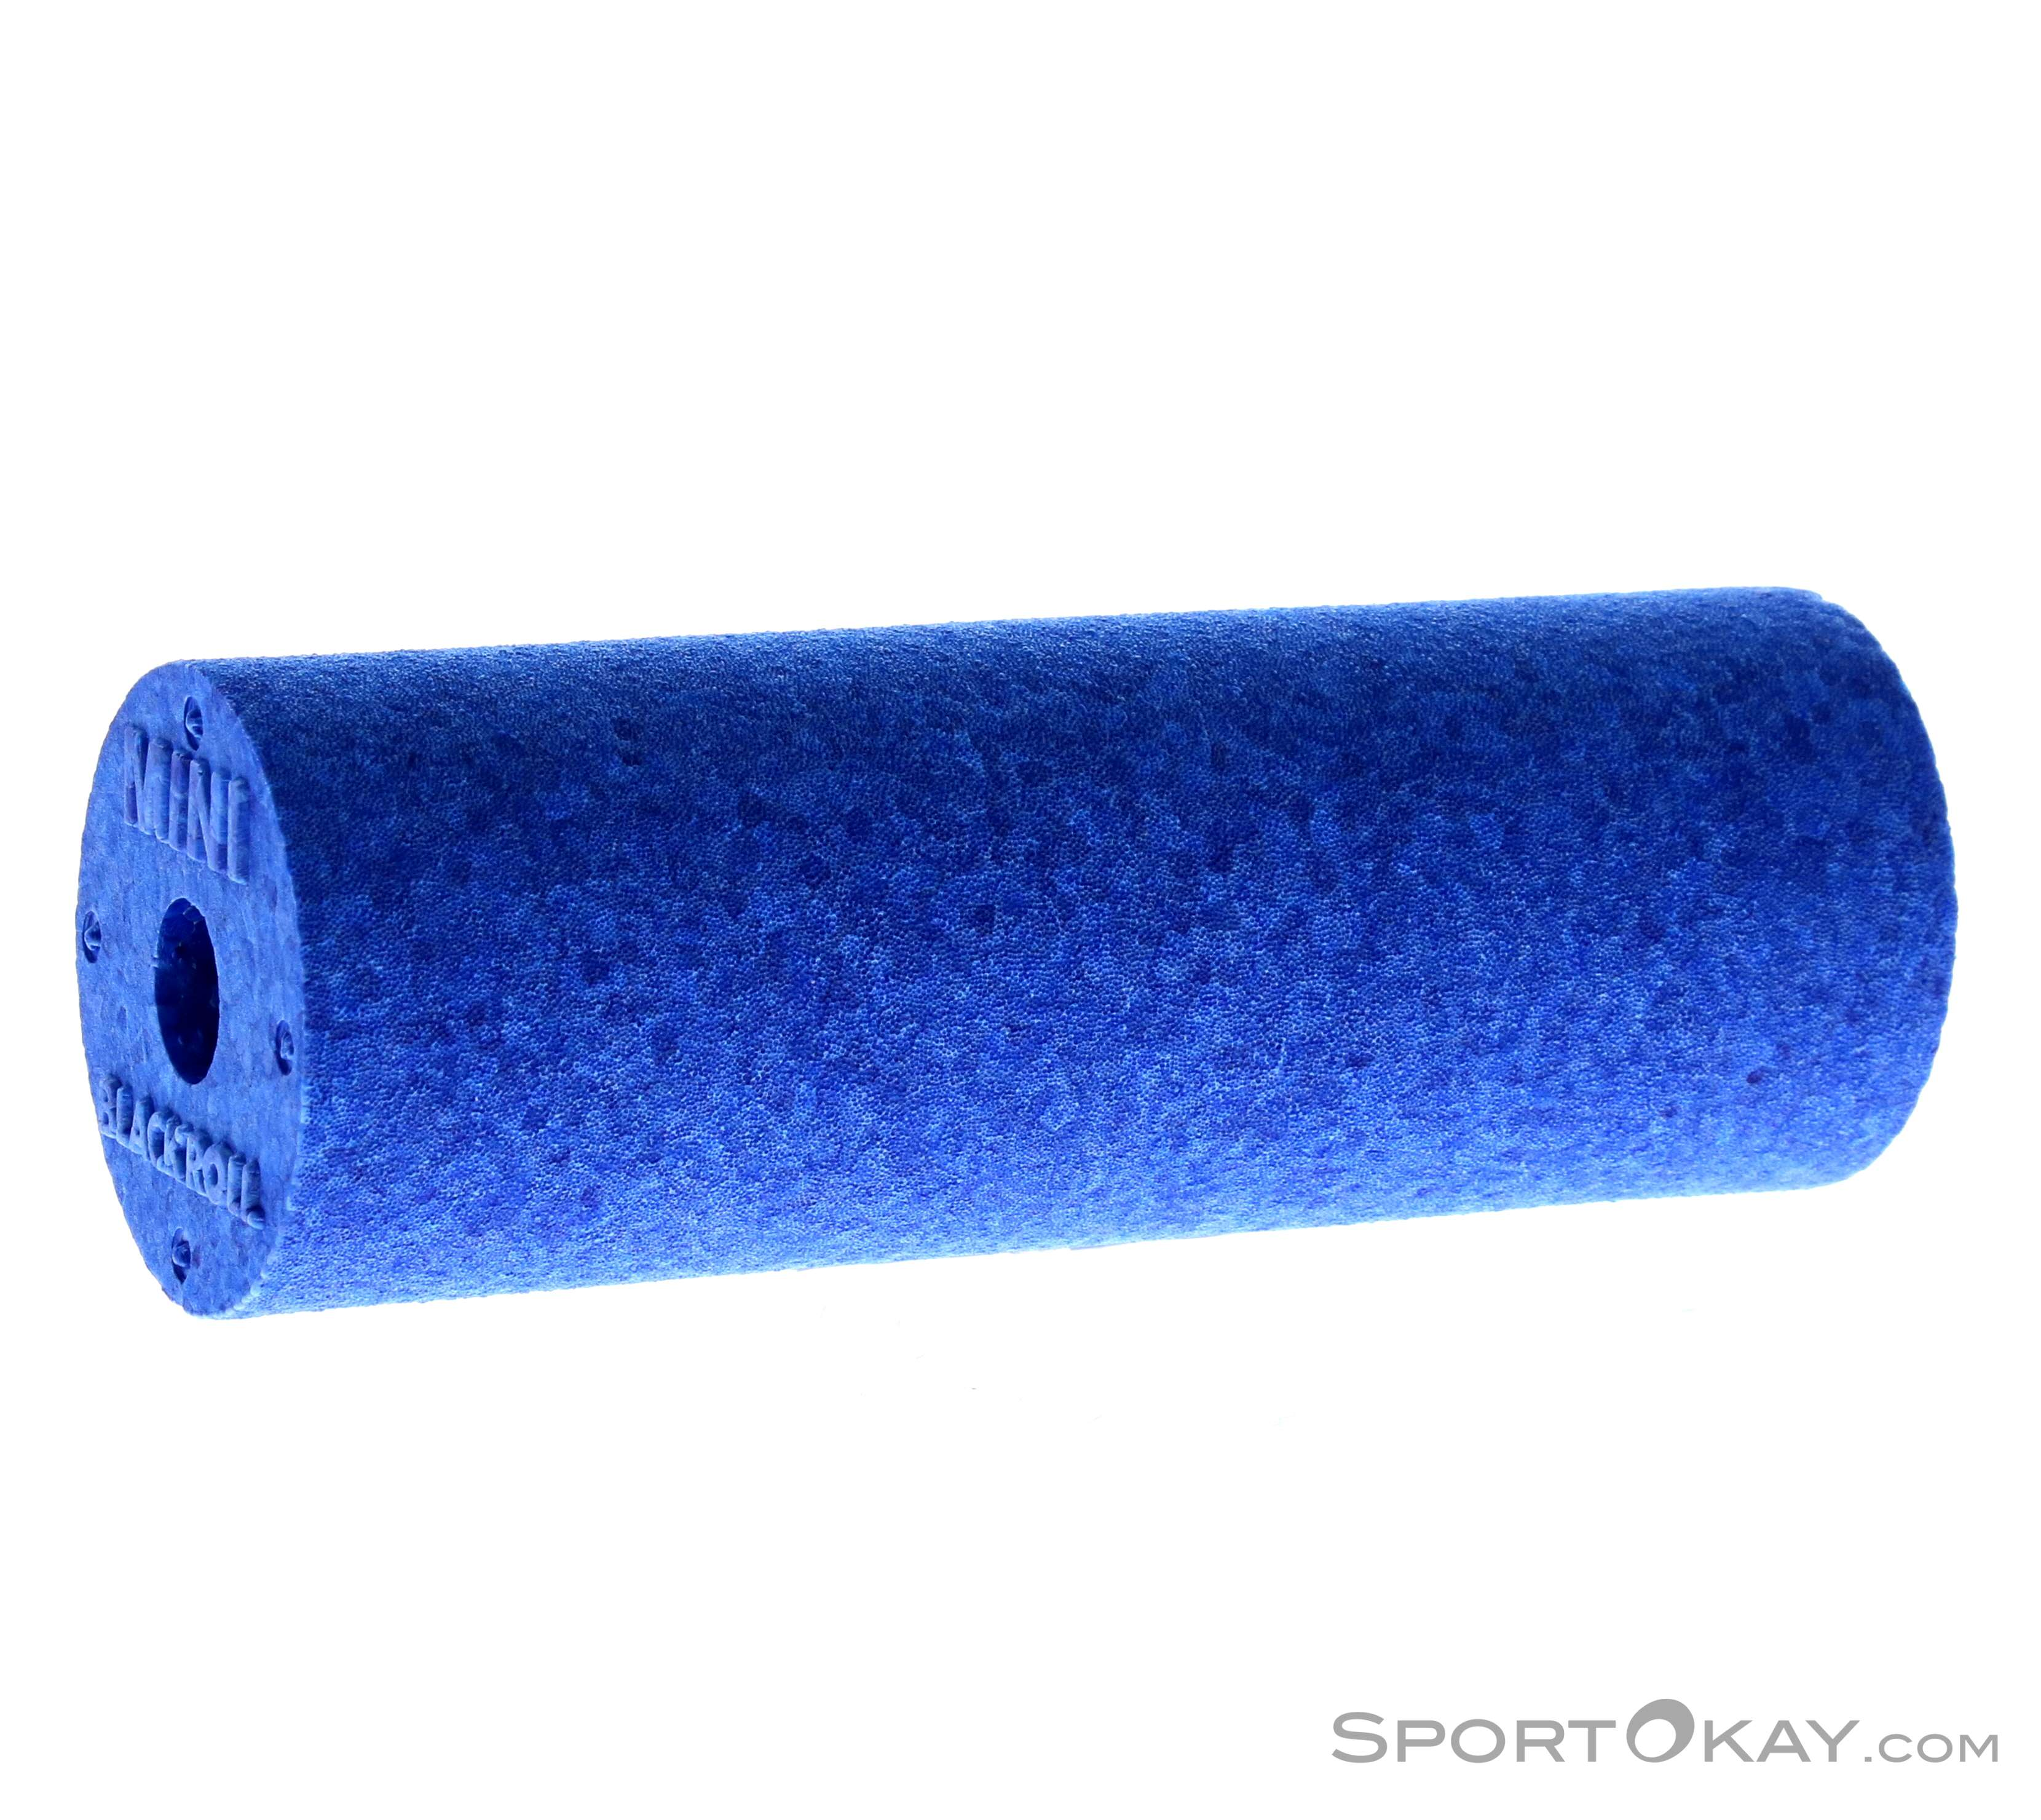 Blackroll Mini Faszienrolle, Blackroll, Blau, , , 0222-10014, 5637476868, 99999999, N1-01.jpg